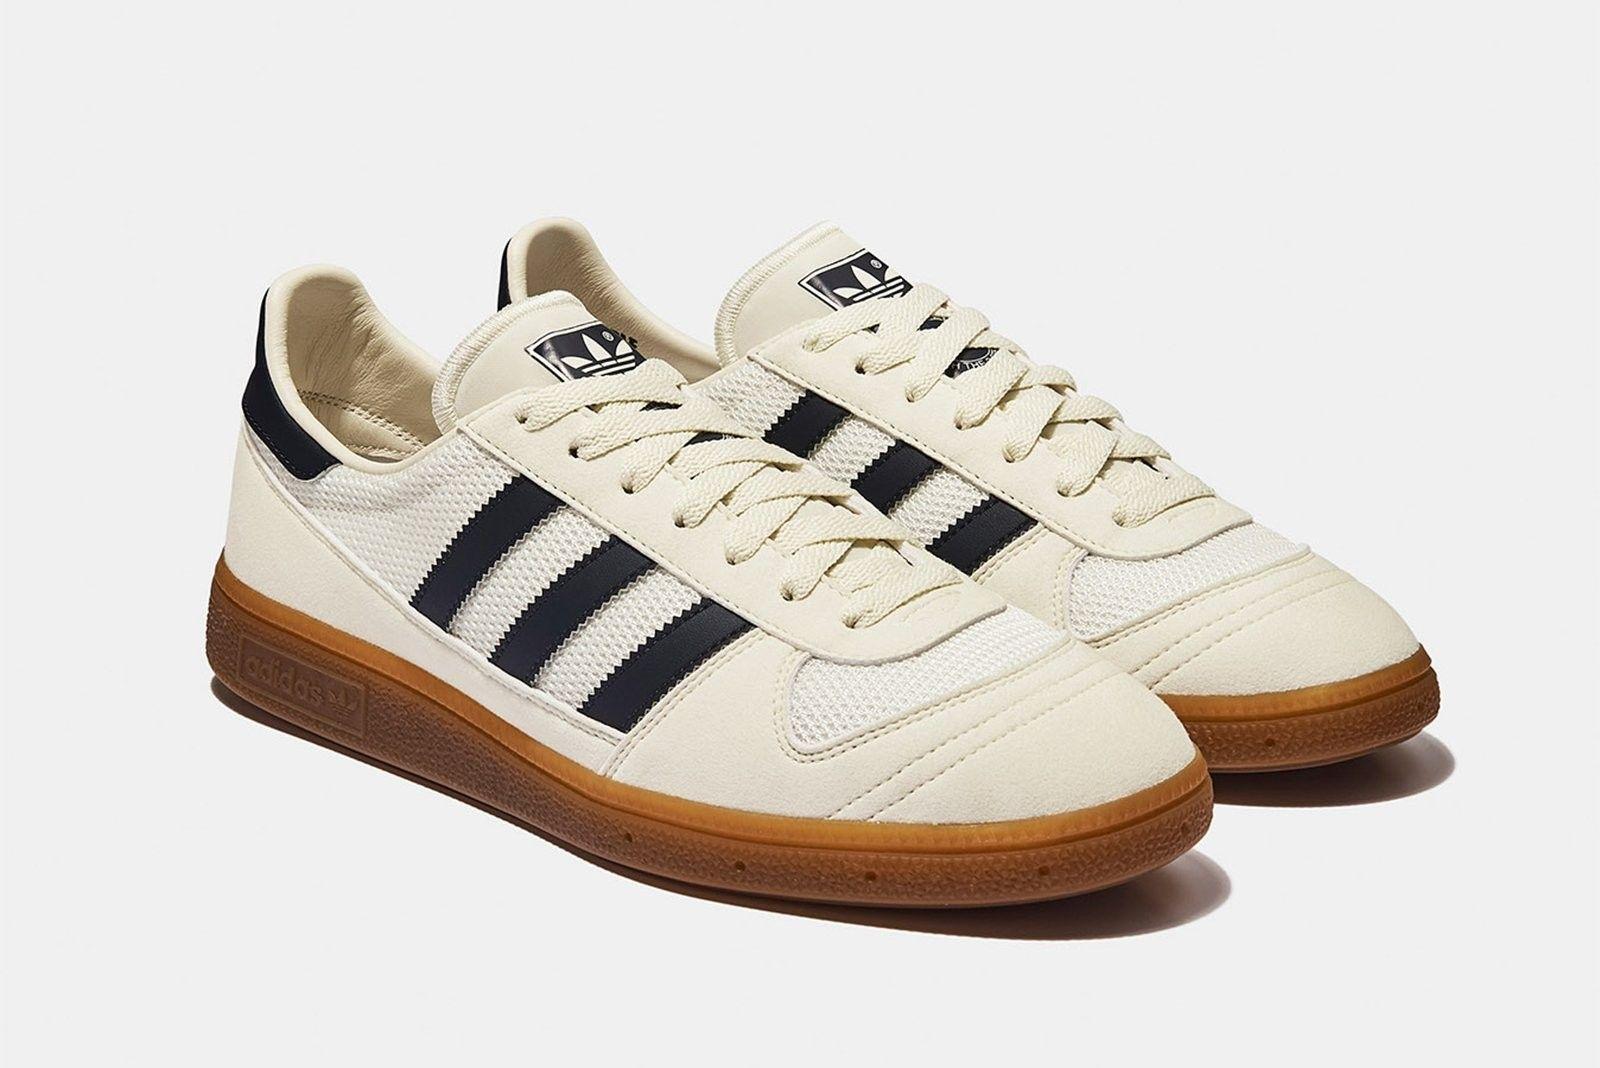 Adidas Wilsy Spezial, launching 21st